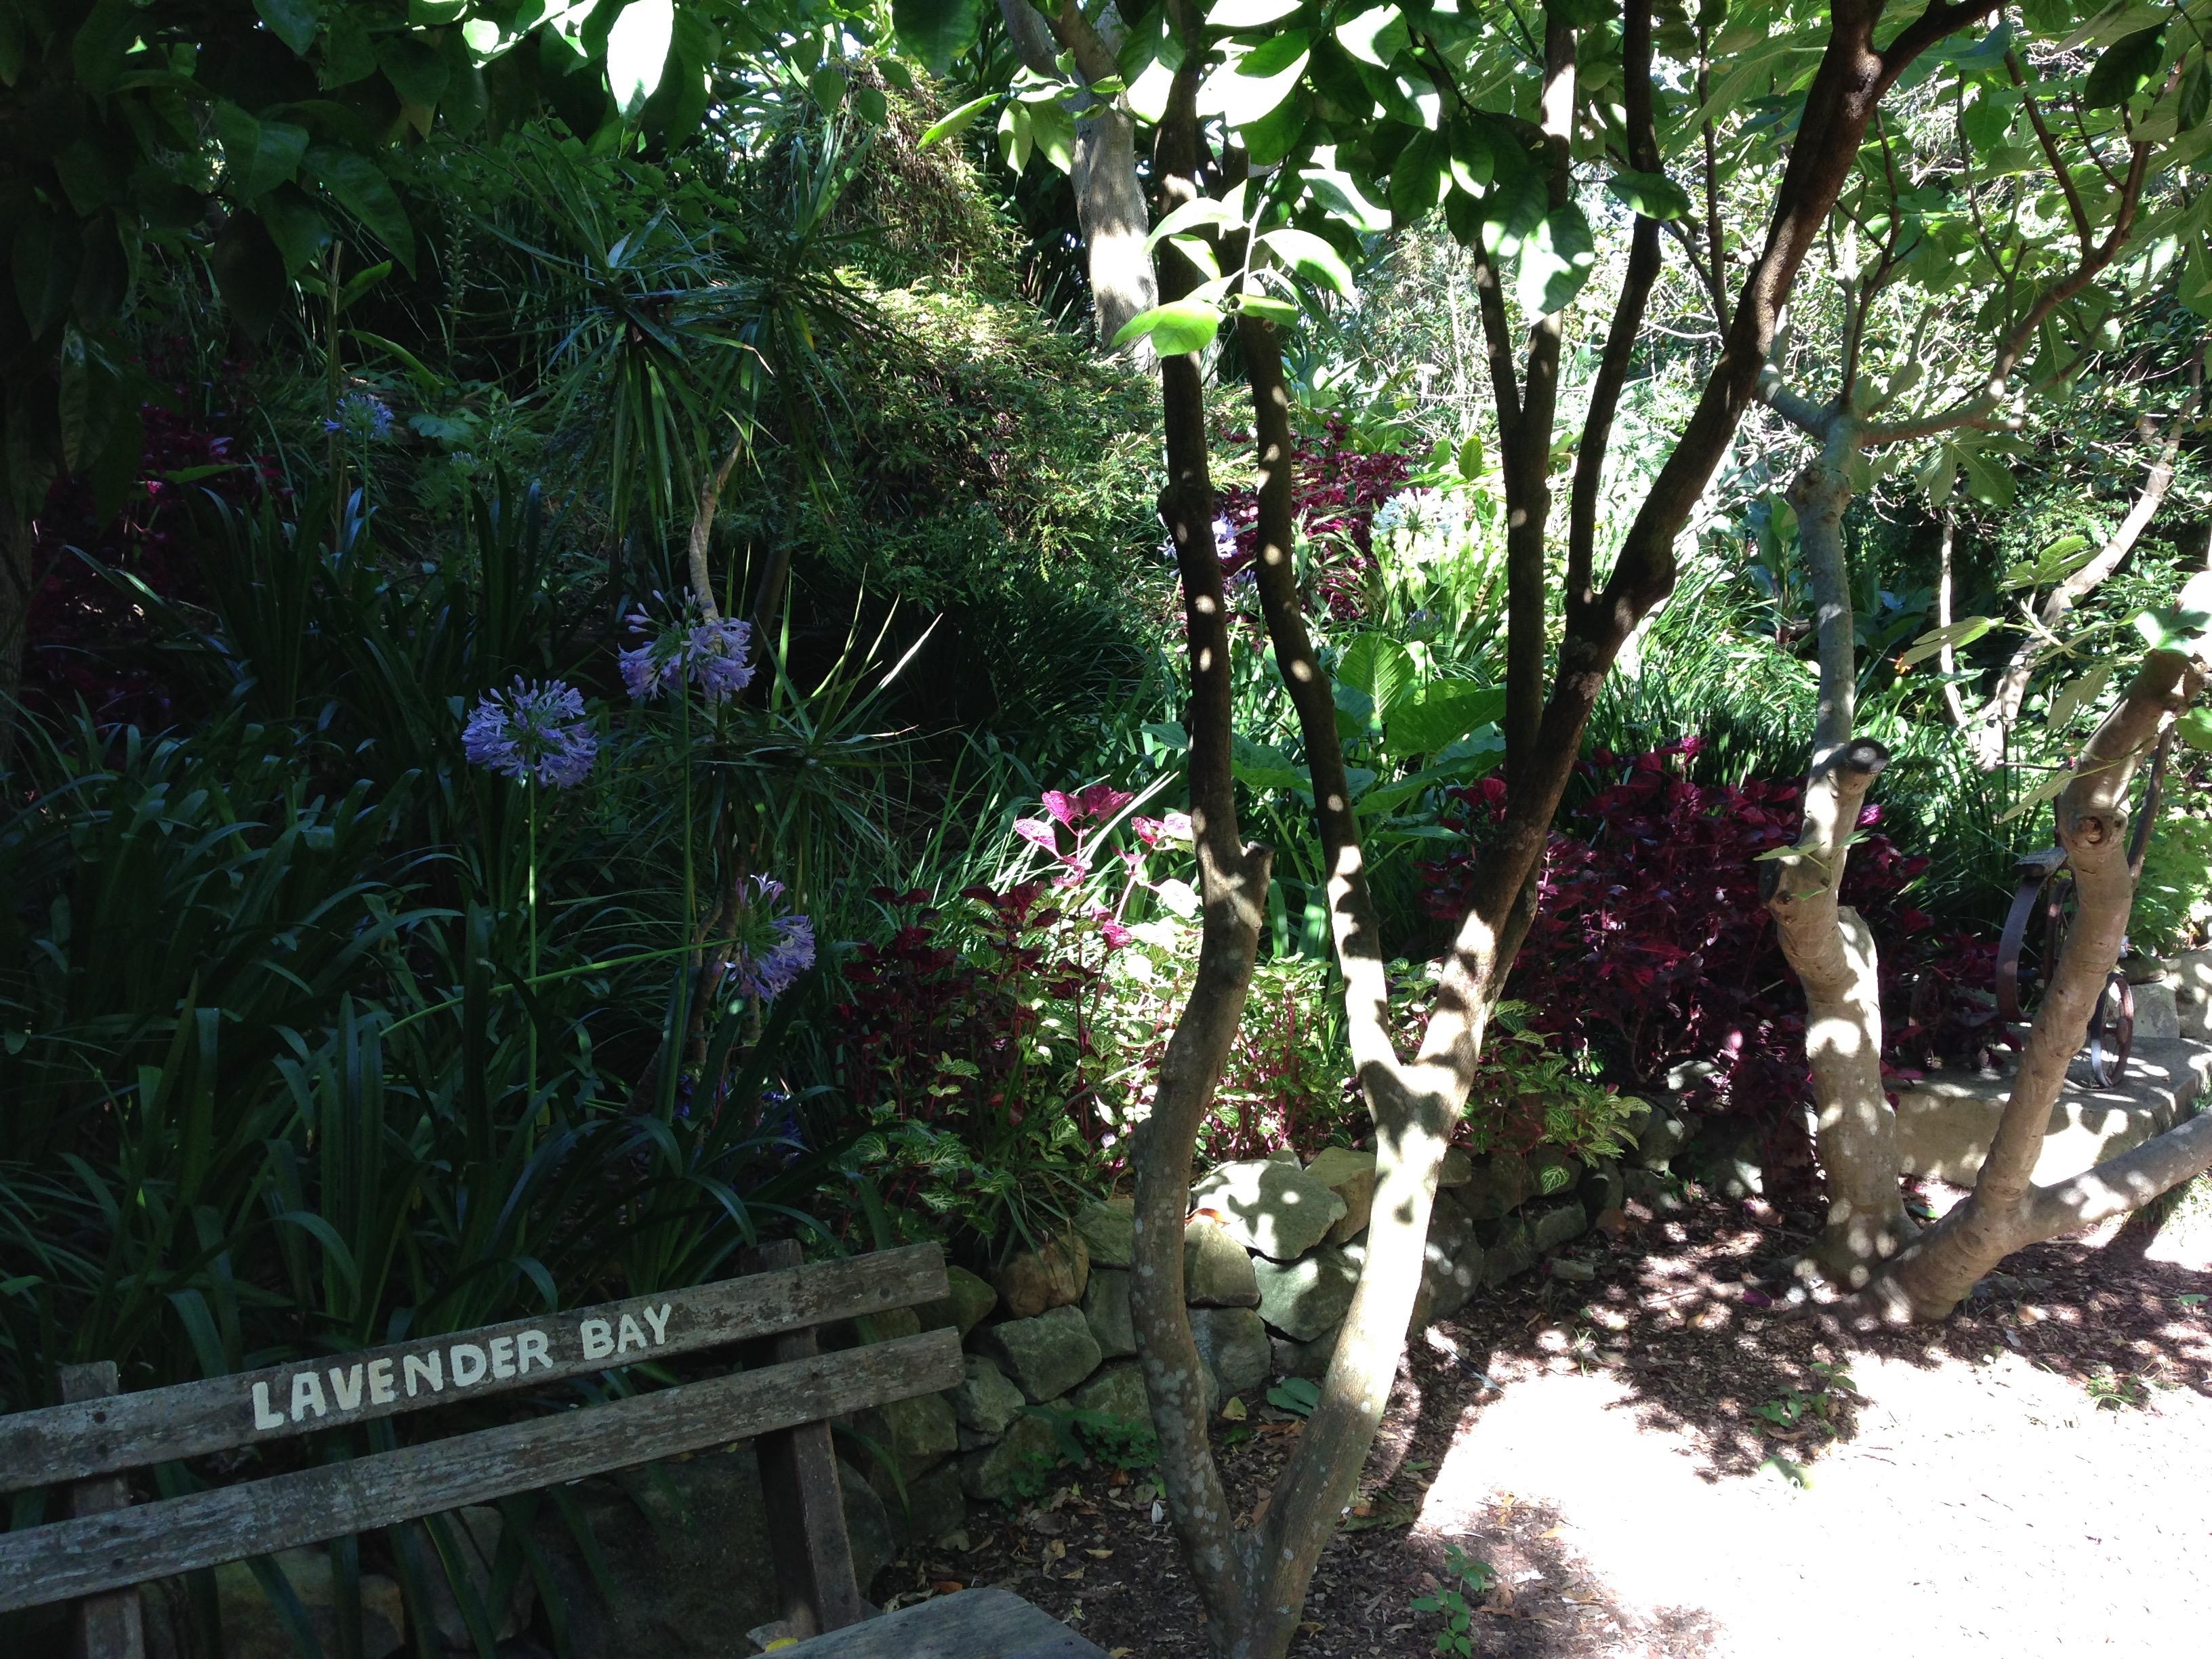 Secret Garden: Wendy's Secret (and Very Inspirational) Garden